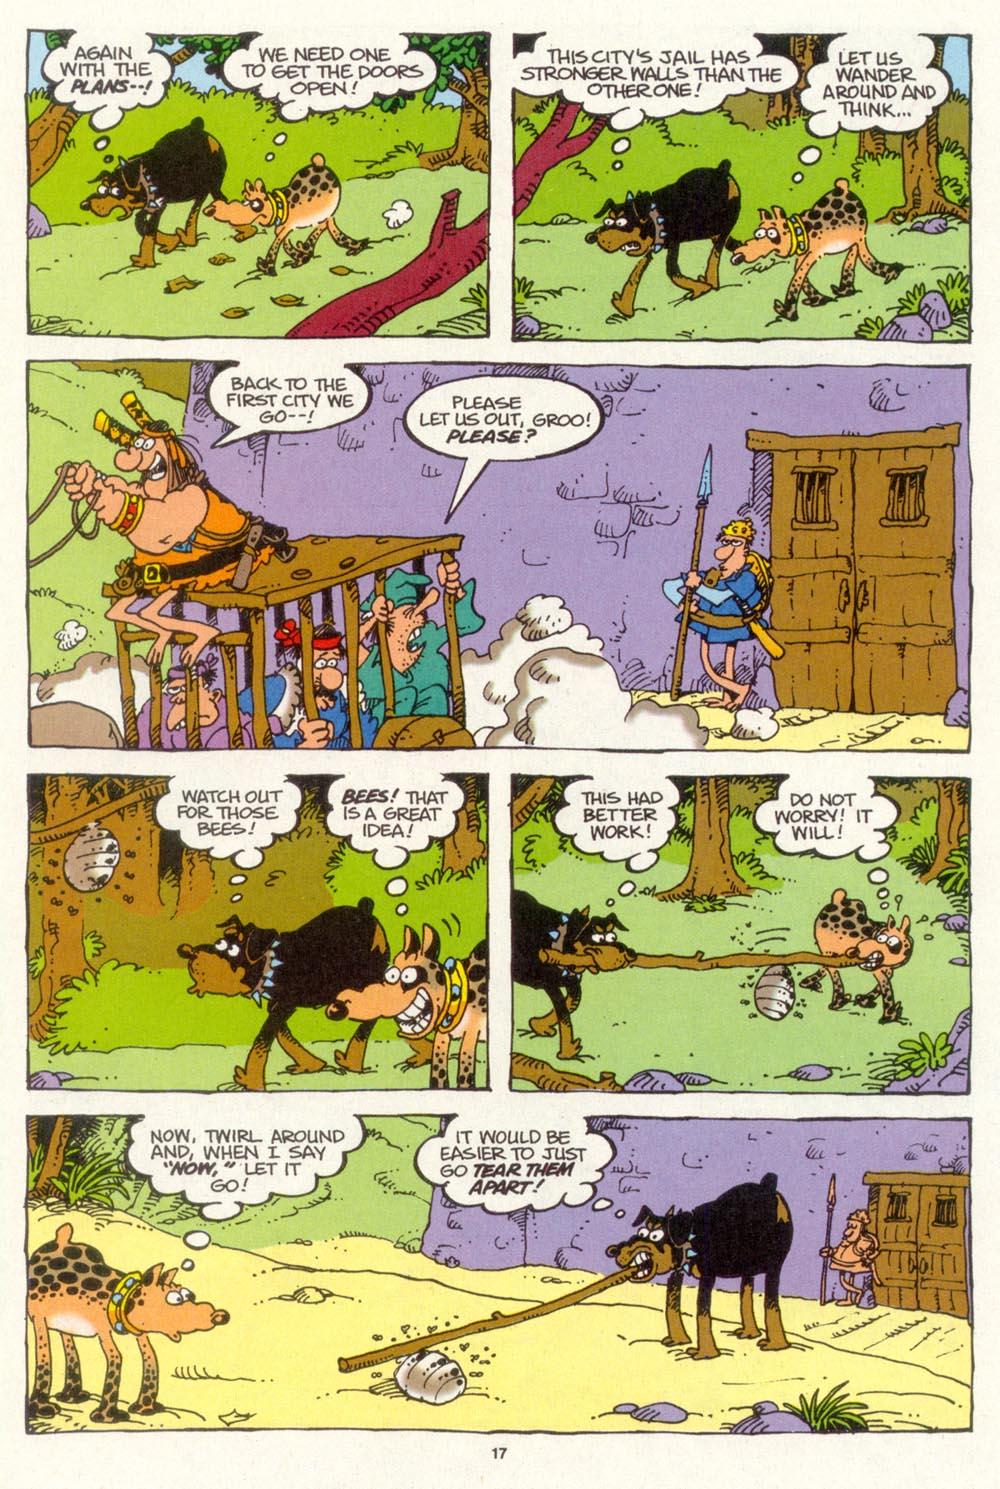 Read online Sergio Aragonés Groo the Wanderer comic -  Issue #103 - 19